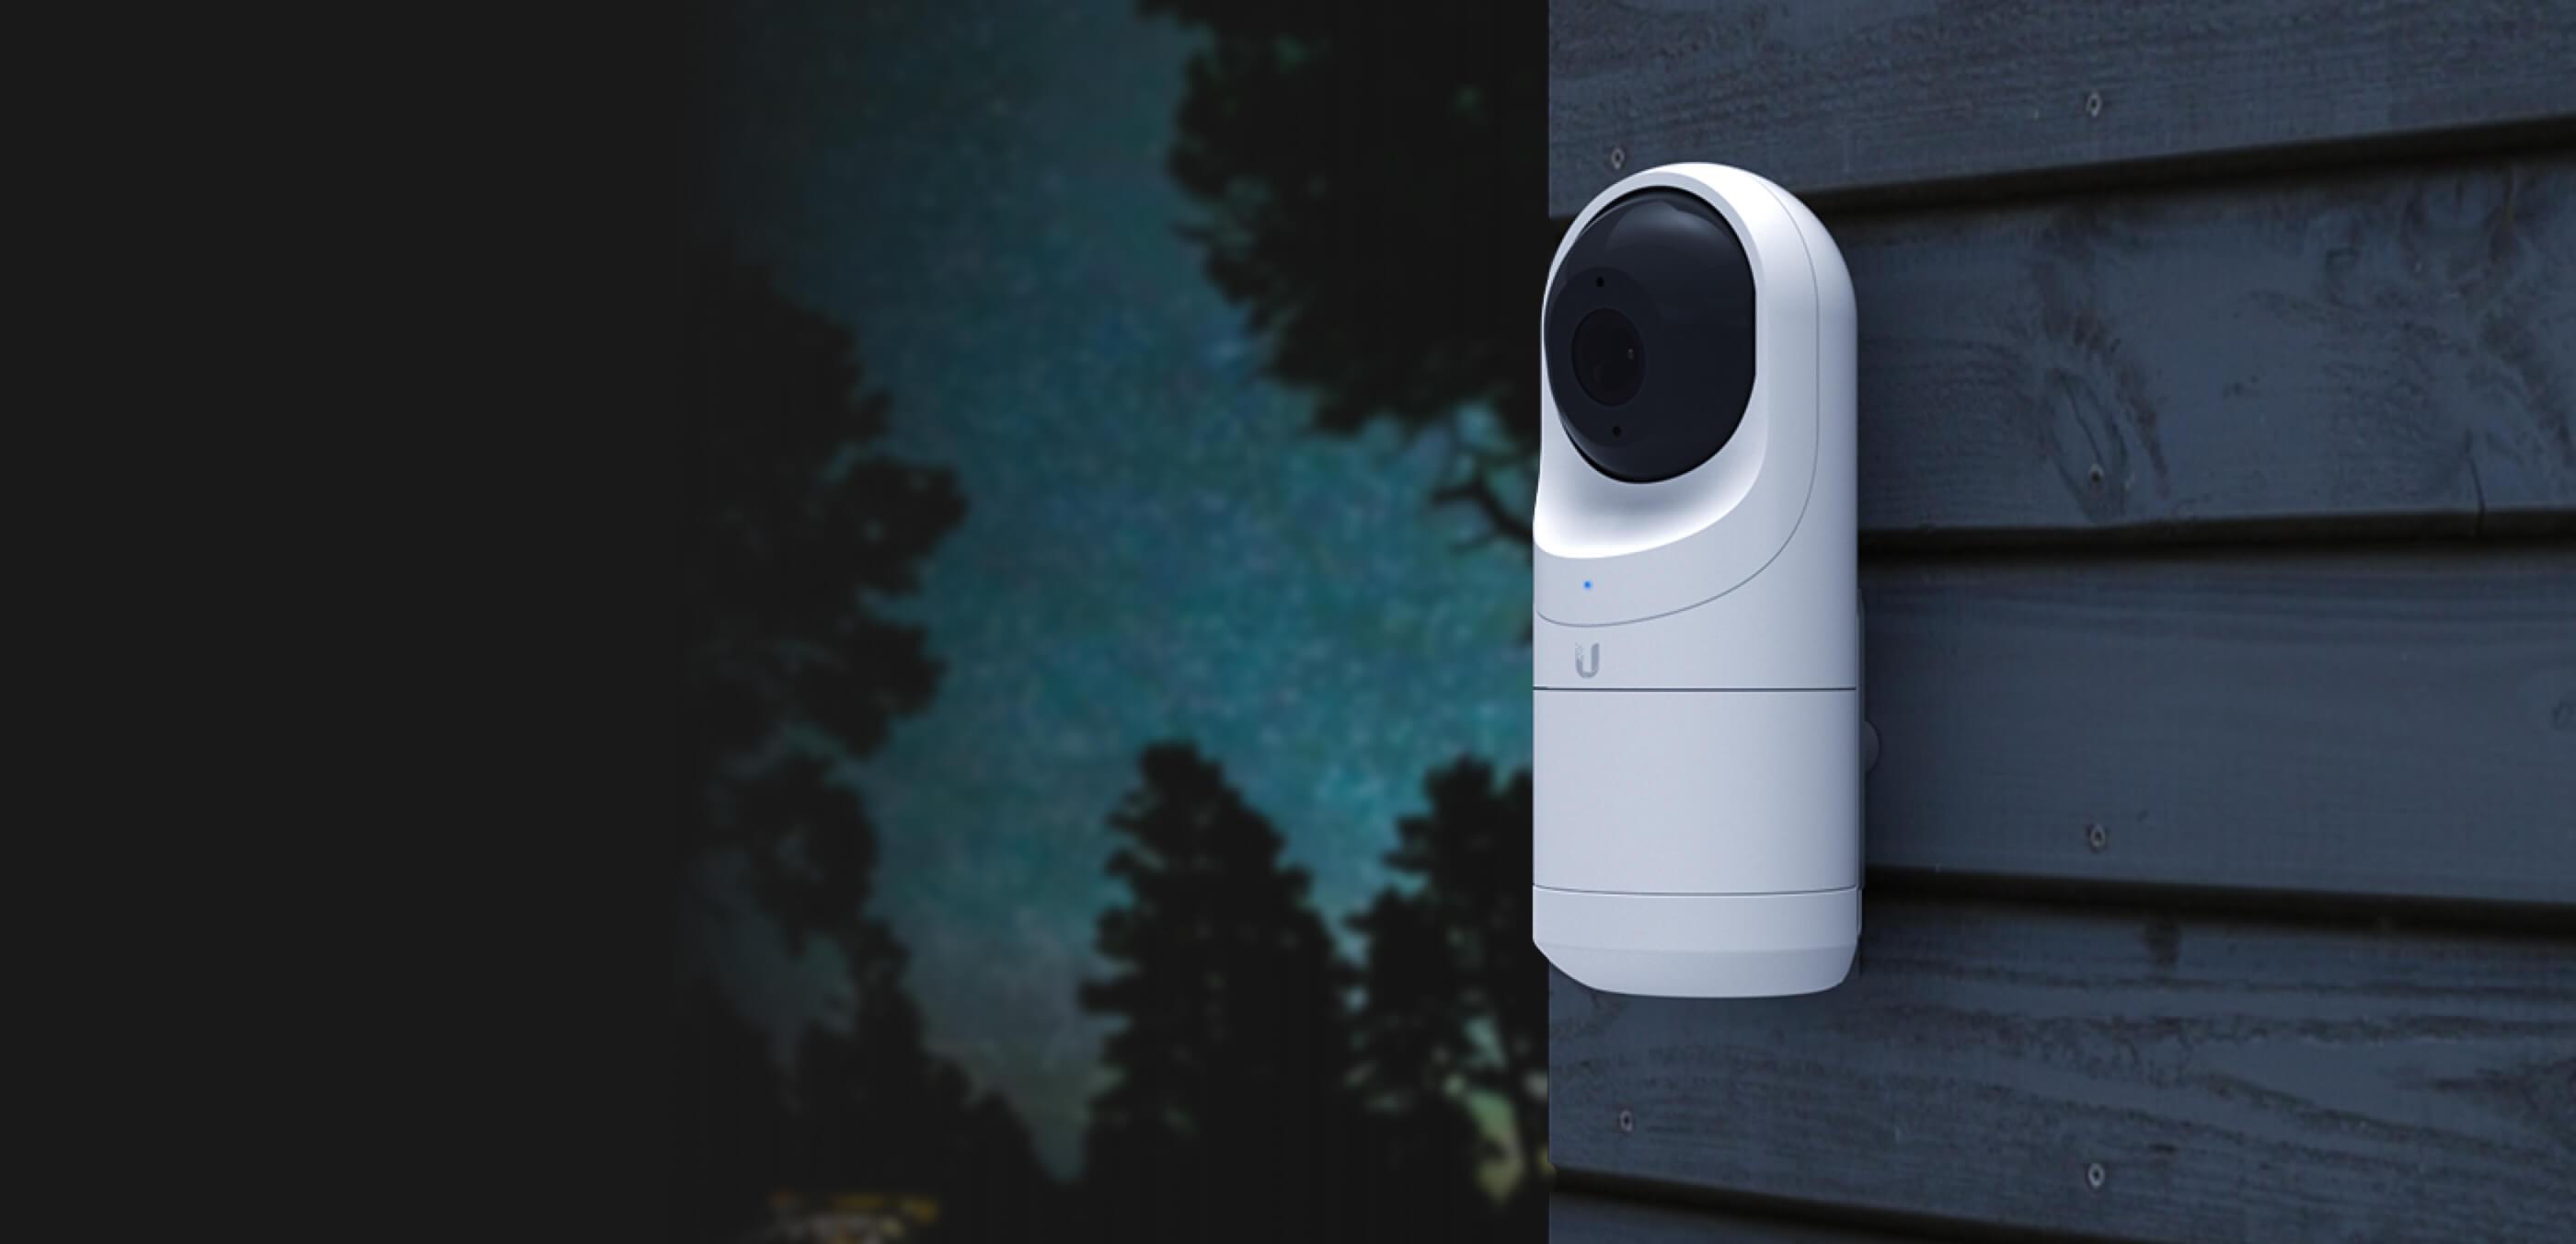 Ubiquiti UVC-G3-Flex 2MP IR Indoor/Outdoor UniFi Video IP Security Camera